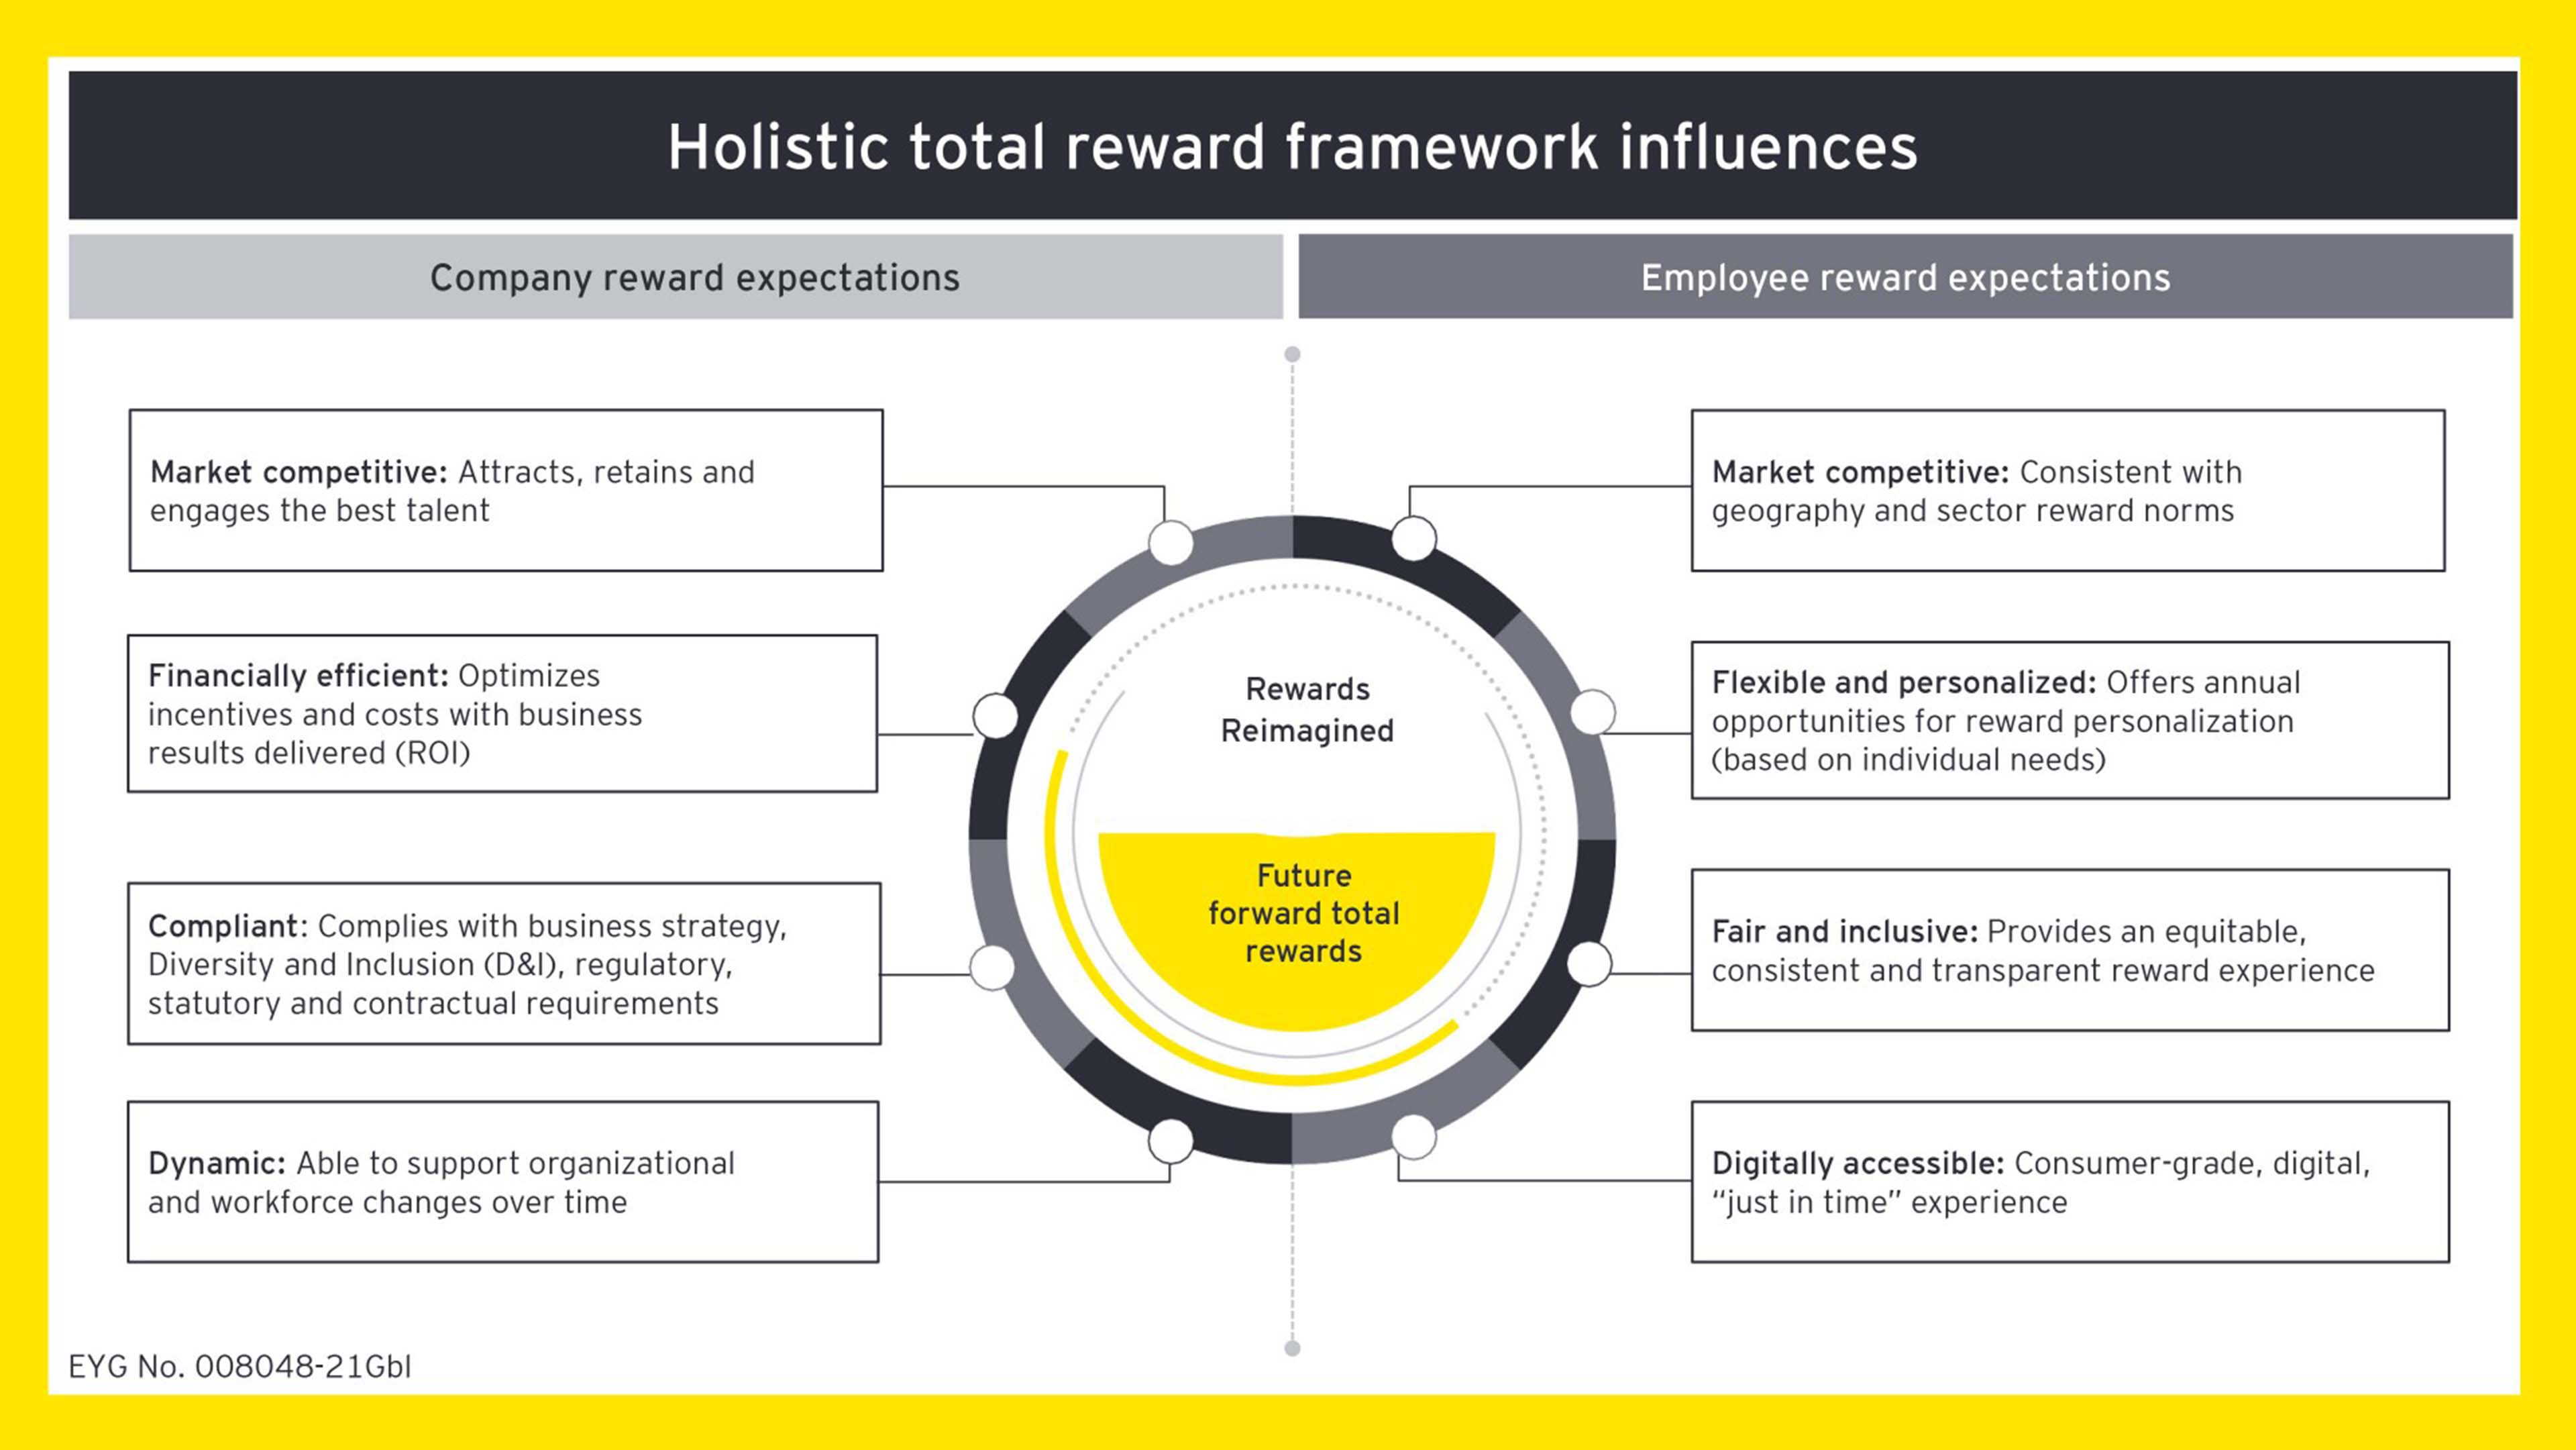 Holistic total reward framework chart